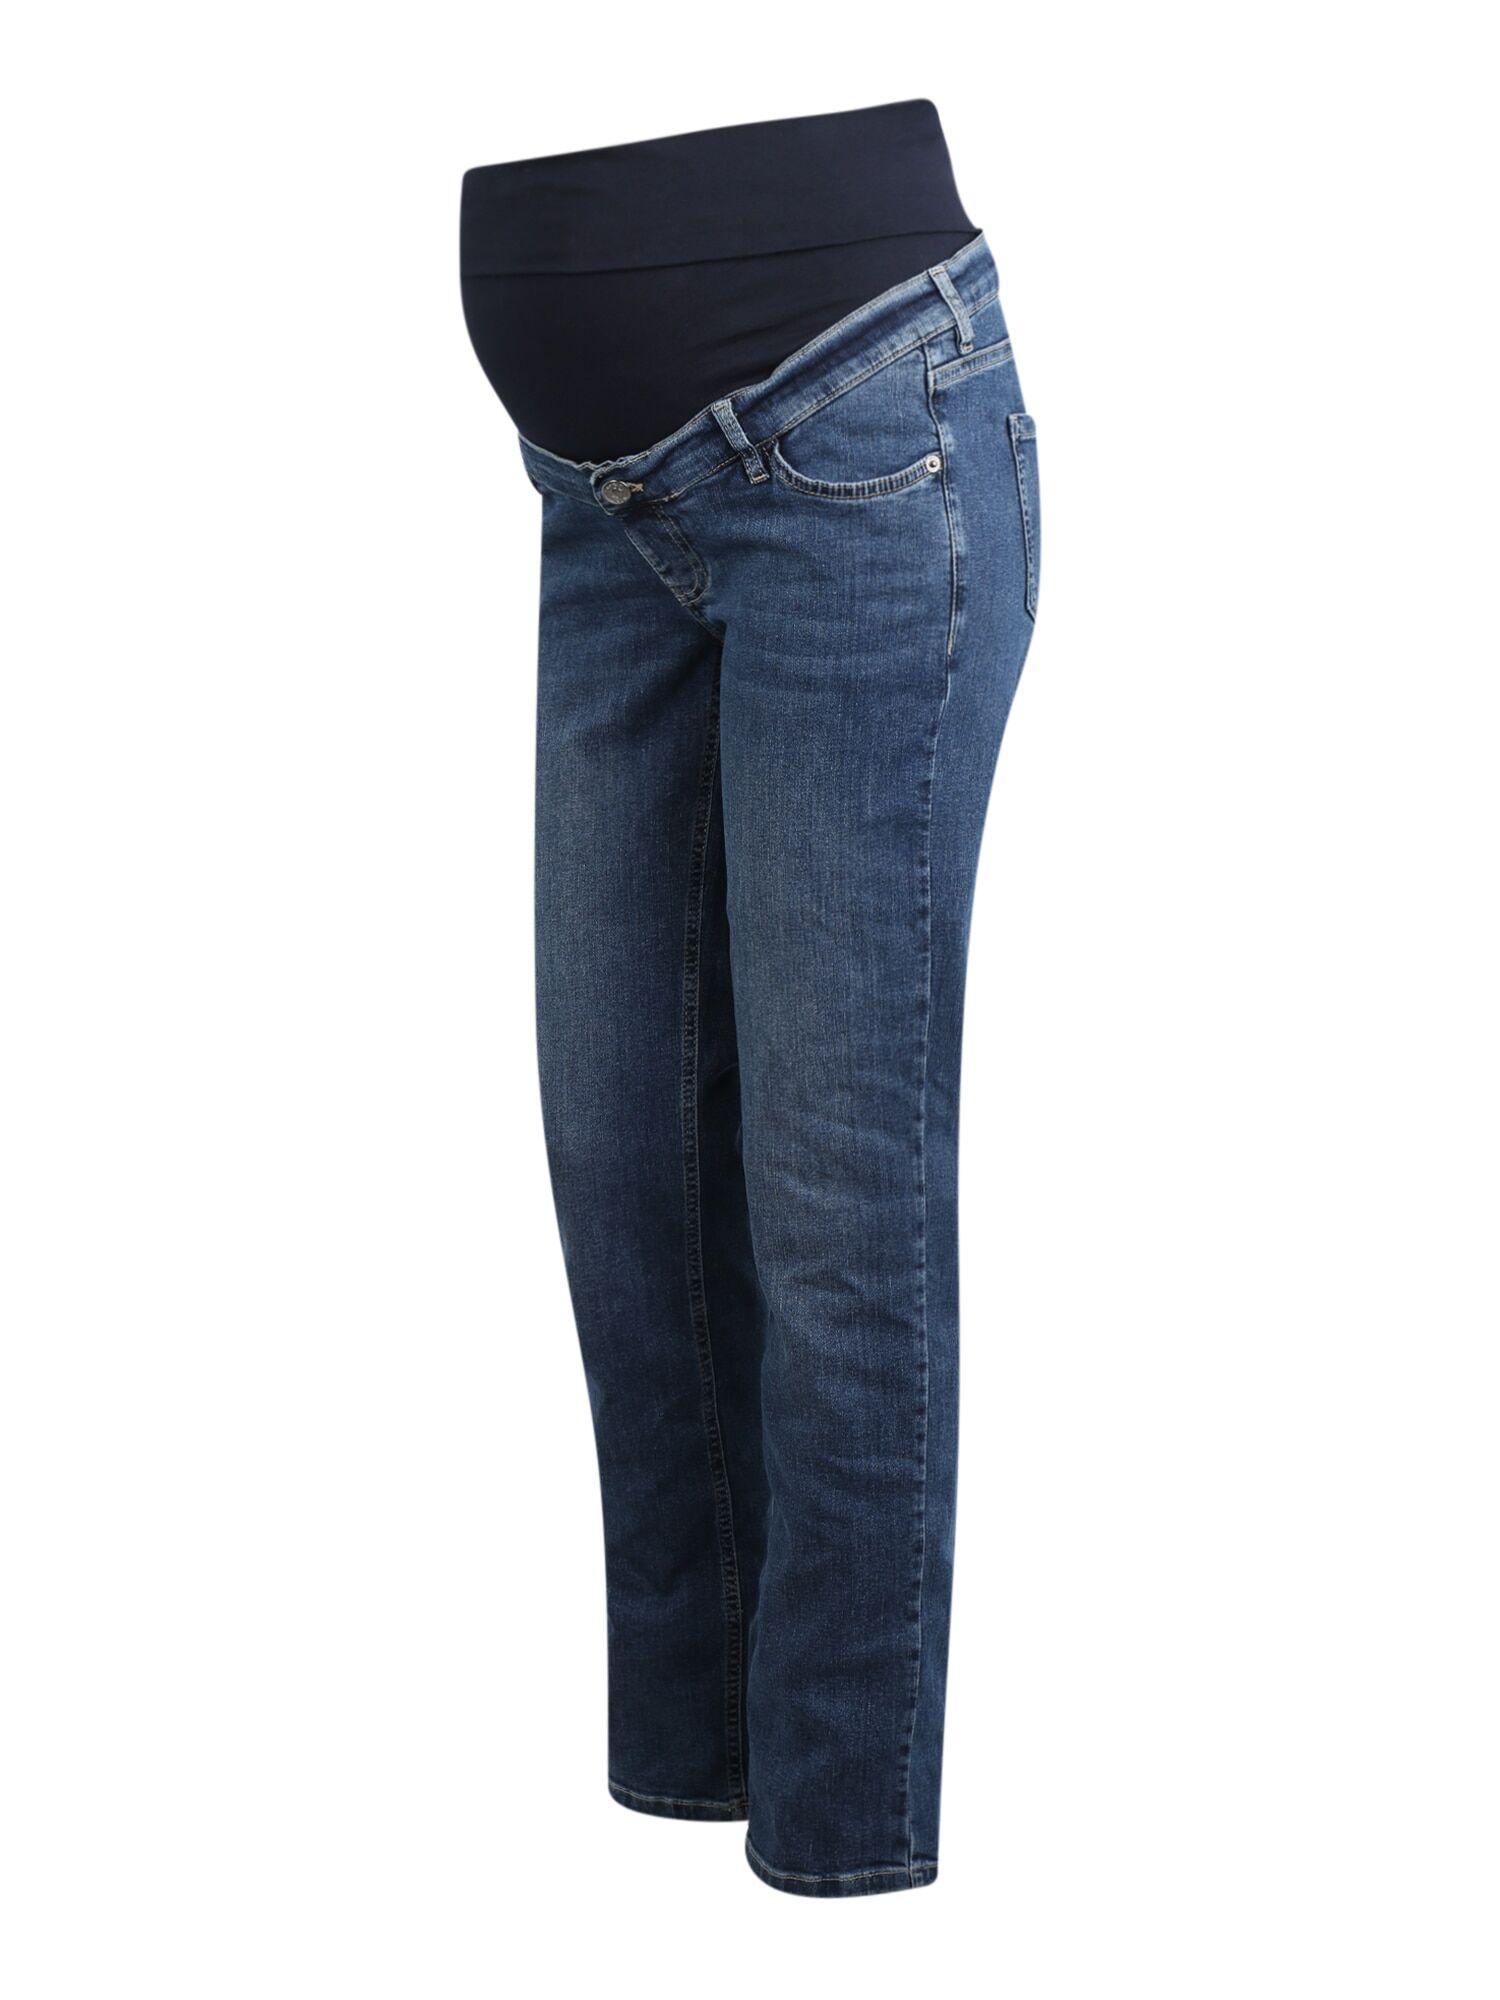 Esprit Jean 'OTB'  - Bleu - Taille: 38/32 - female